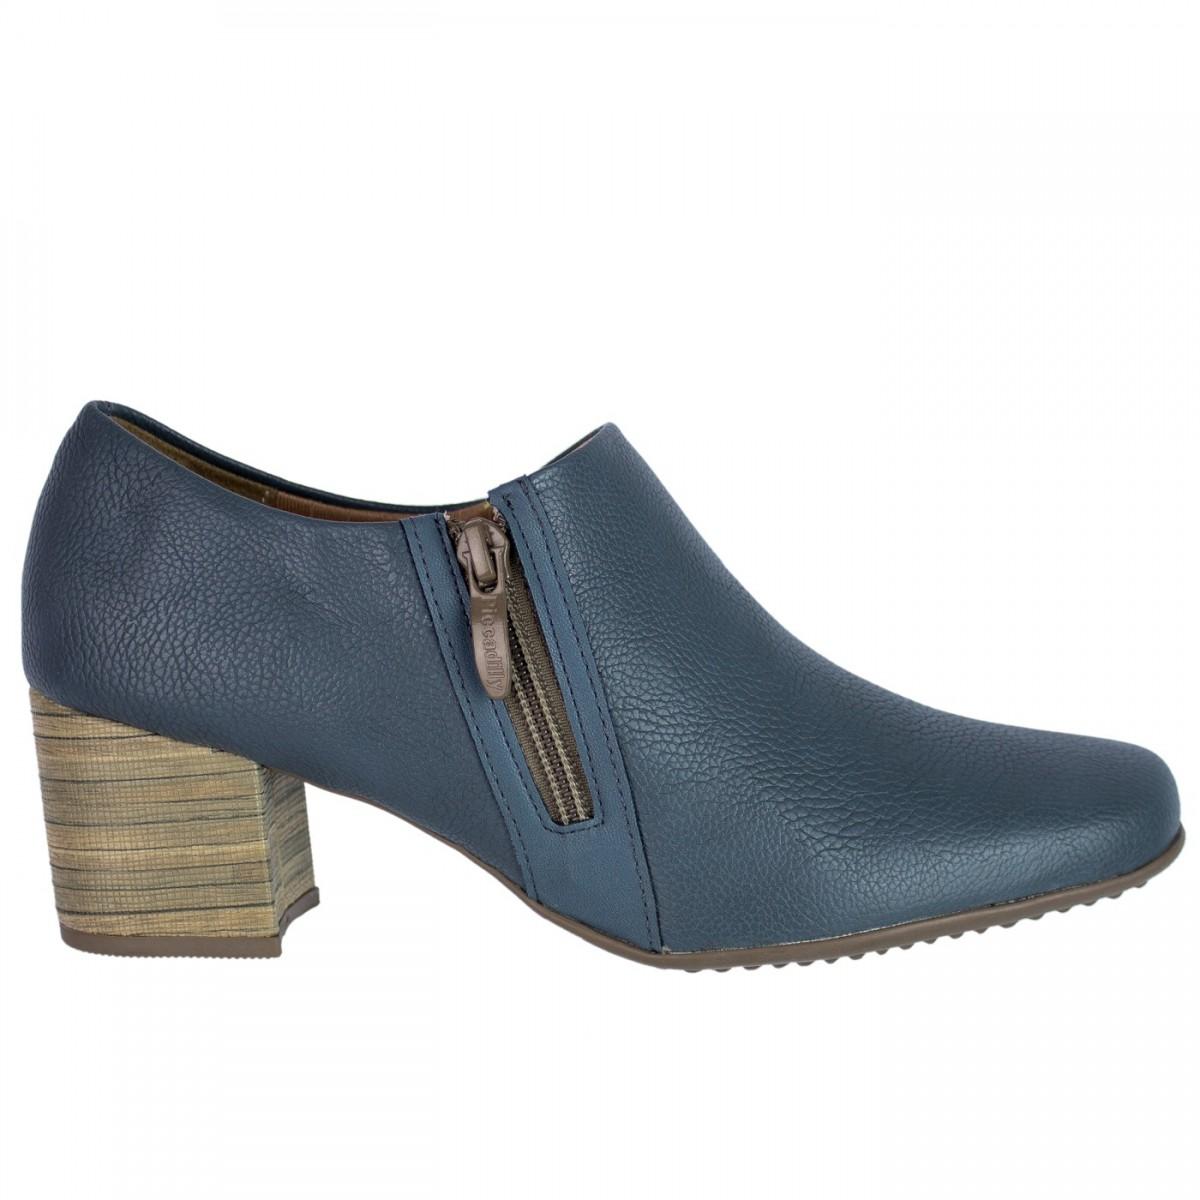 05854dac0 Bizz Store - Sapato Feminino Piccadilly Relax Couro Sintético